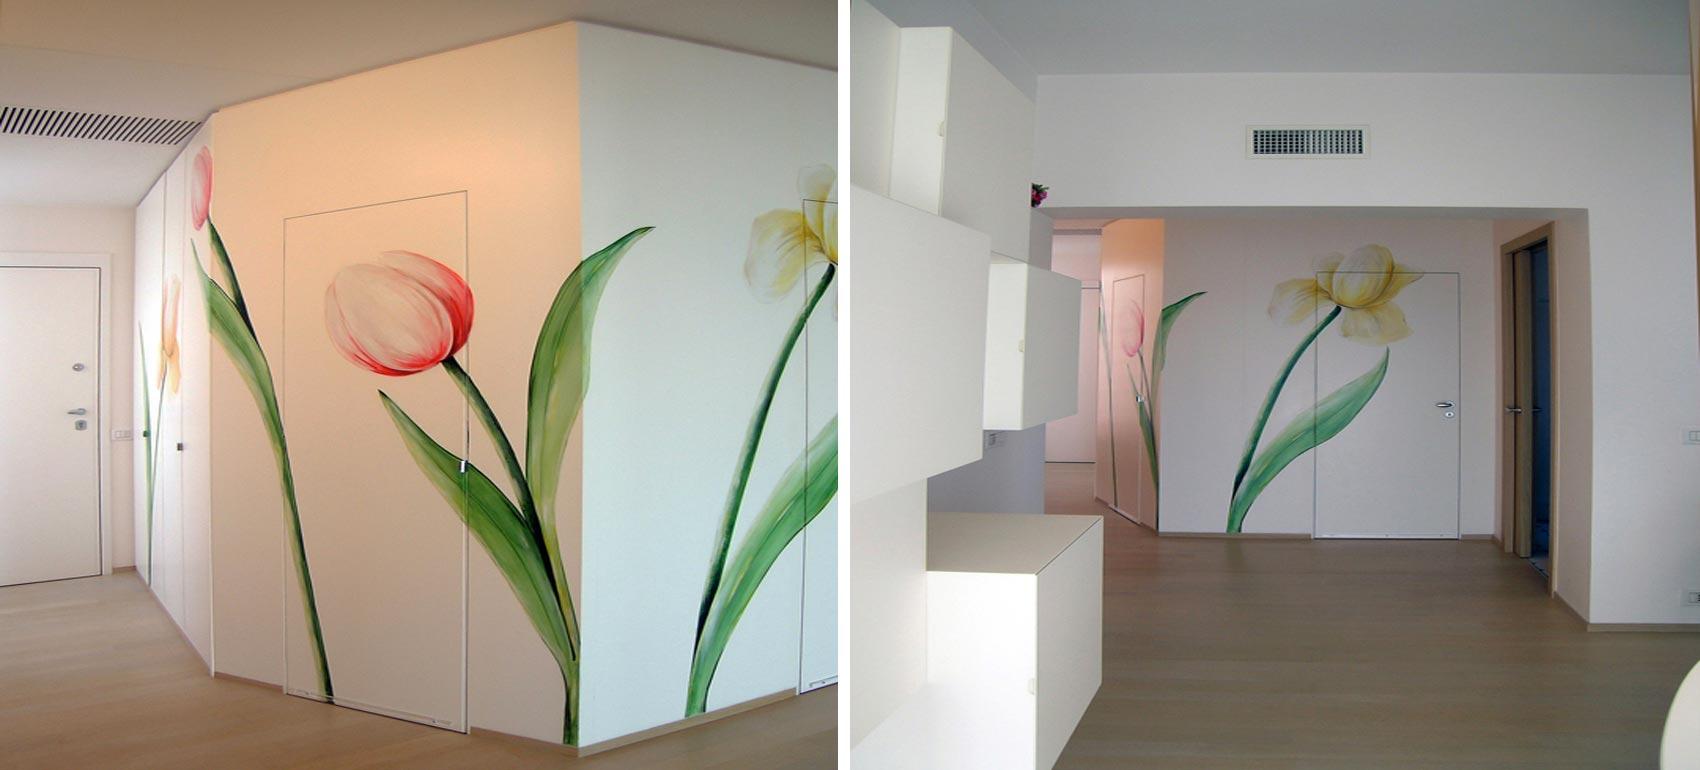 stefanoturi-architetto_residenzaprivata3_3